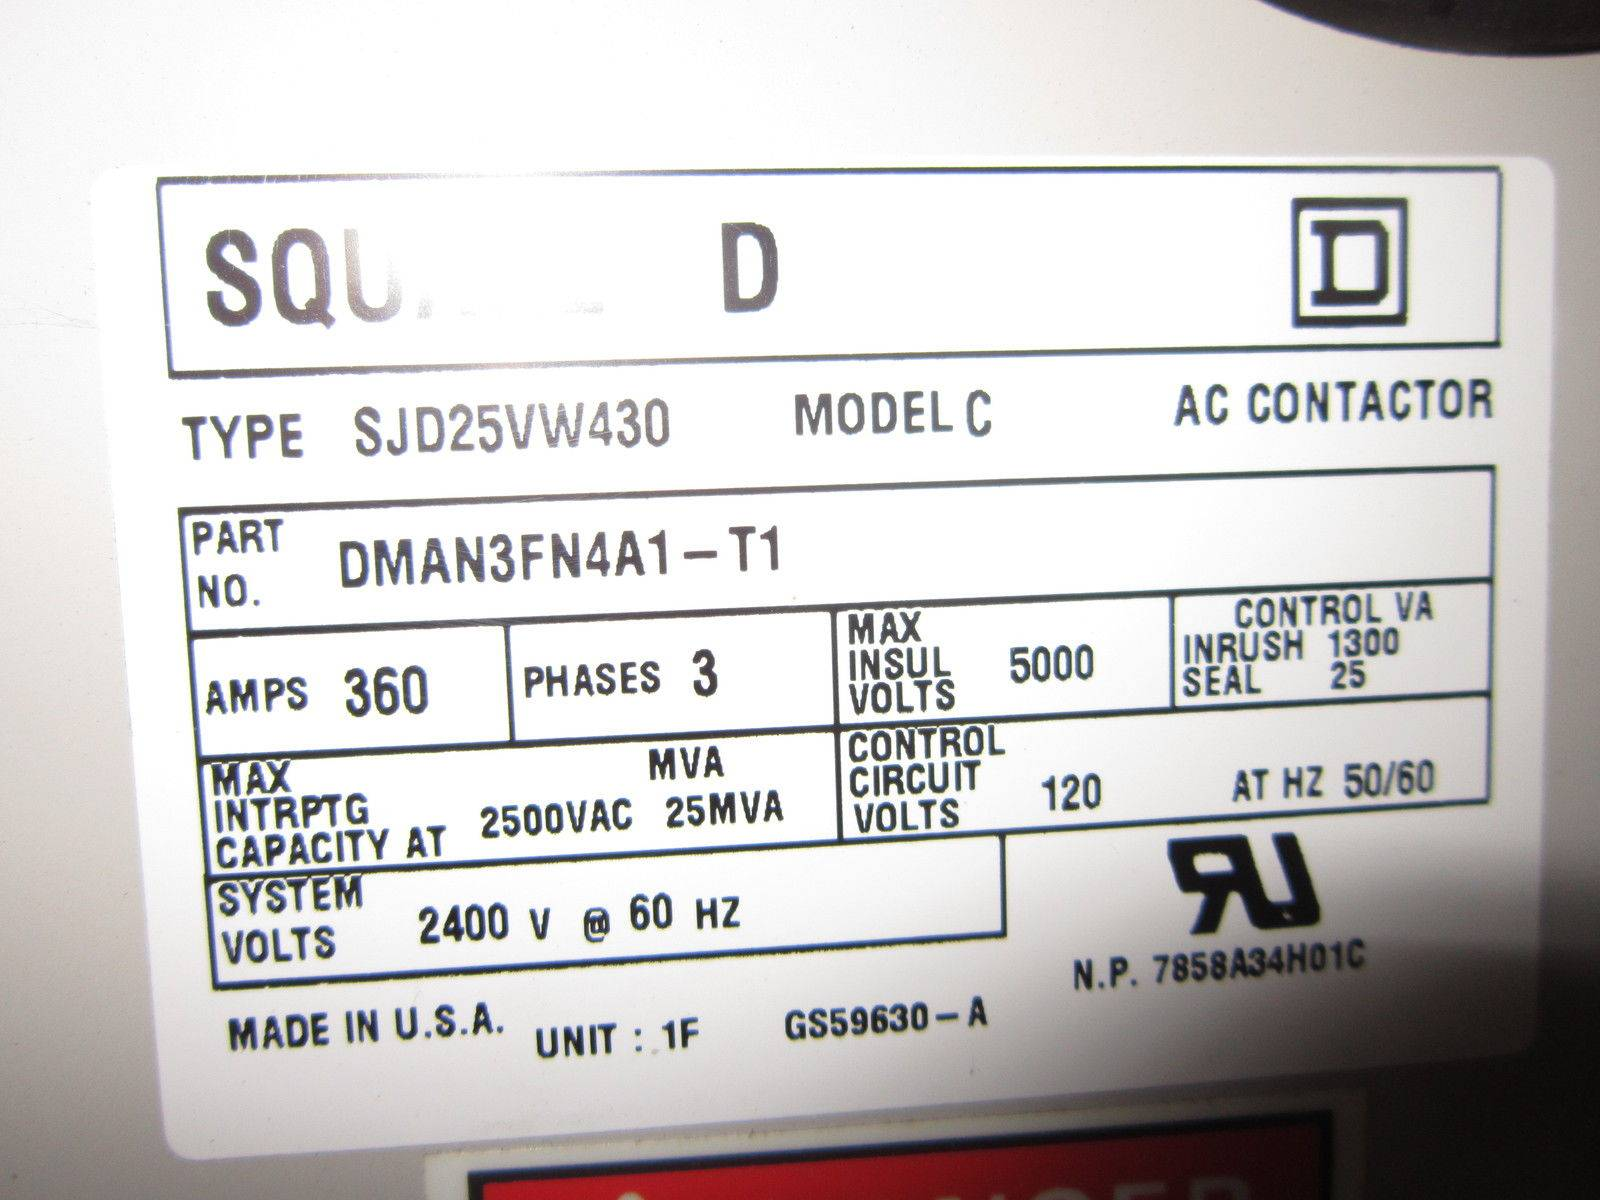 exide system 1000 wiring diagram Files. hertner auto 5000 3 phase to 1  phase wiring diagram 51